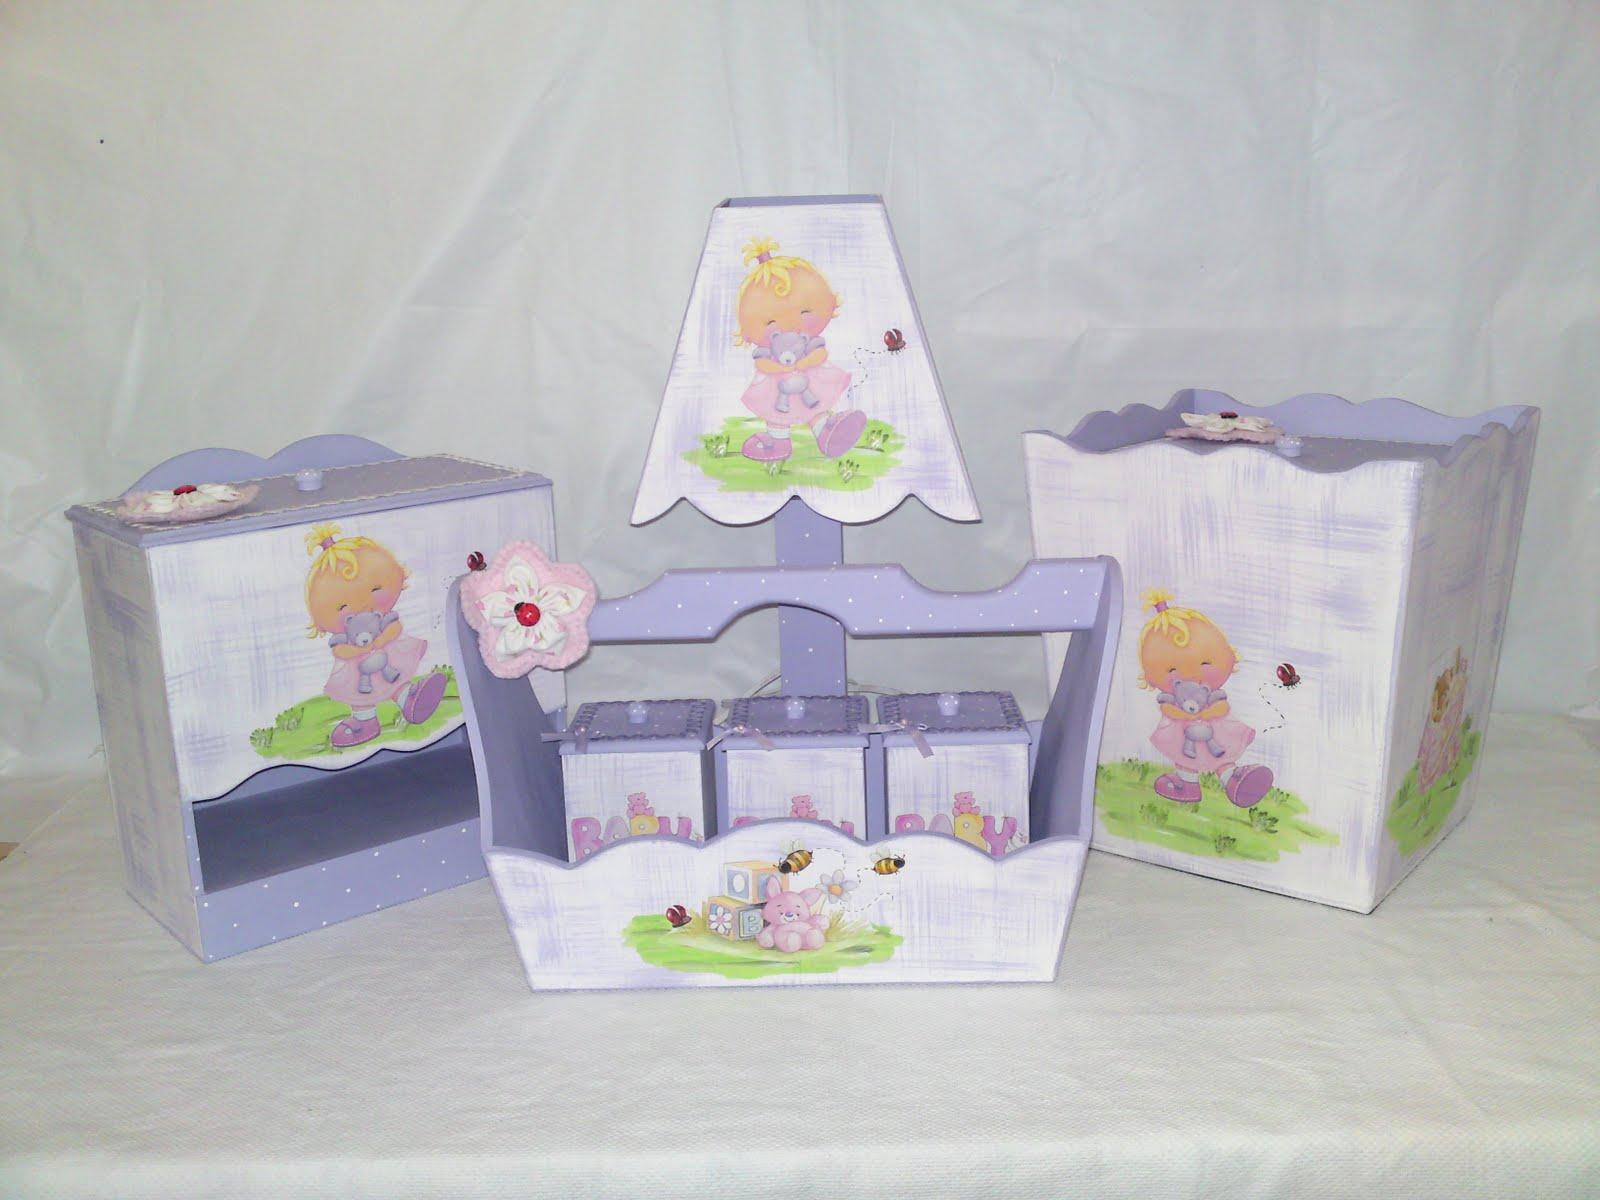 Meninas Usemann Artesanatos: Kit higiene branco pátina lilás  #748249 1600 1200